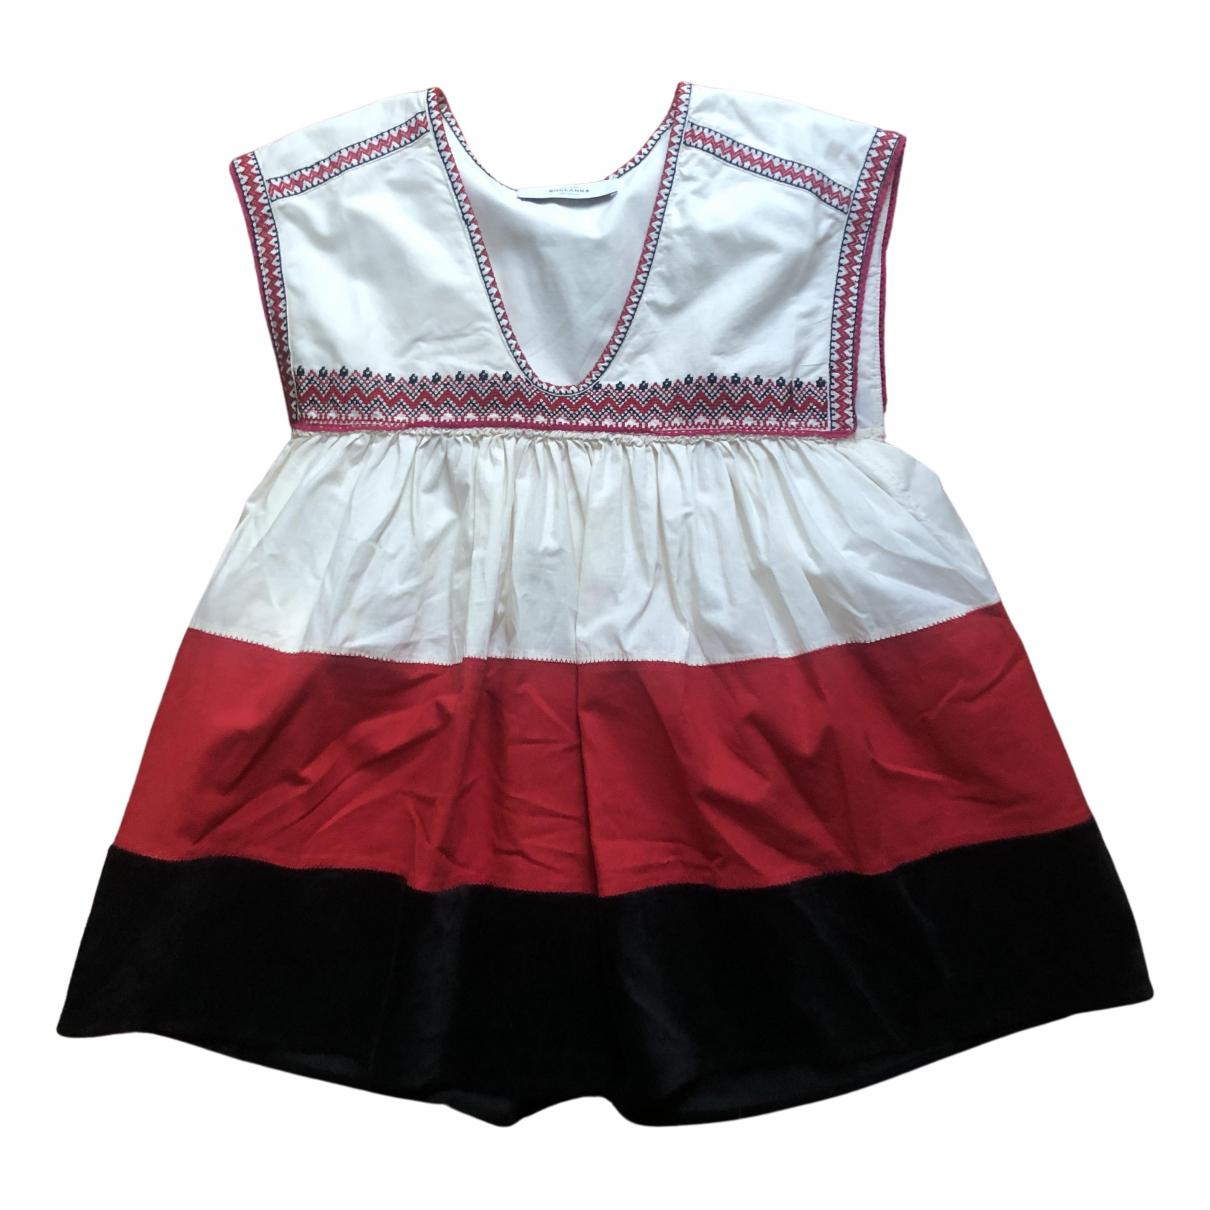 Roseanna - Top   pour femme en coton - ecru